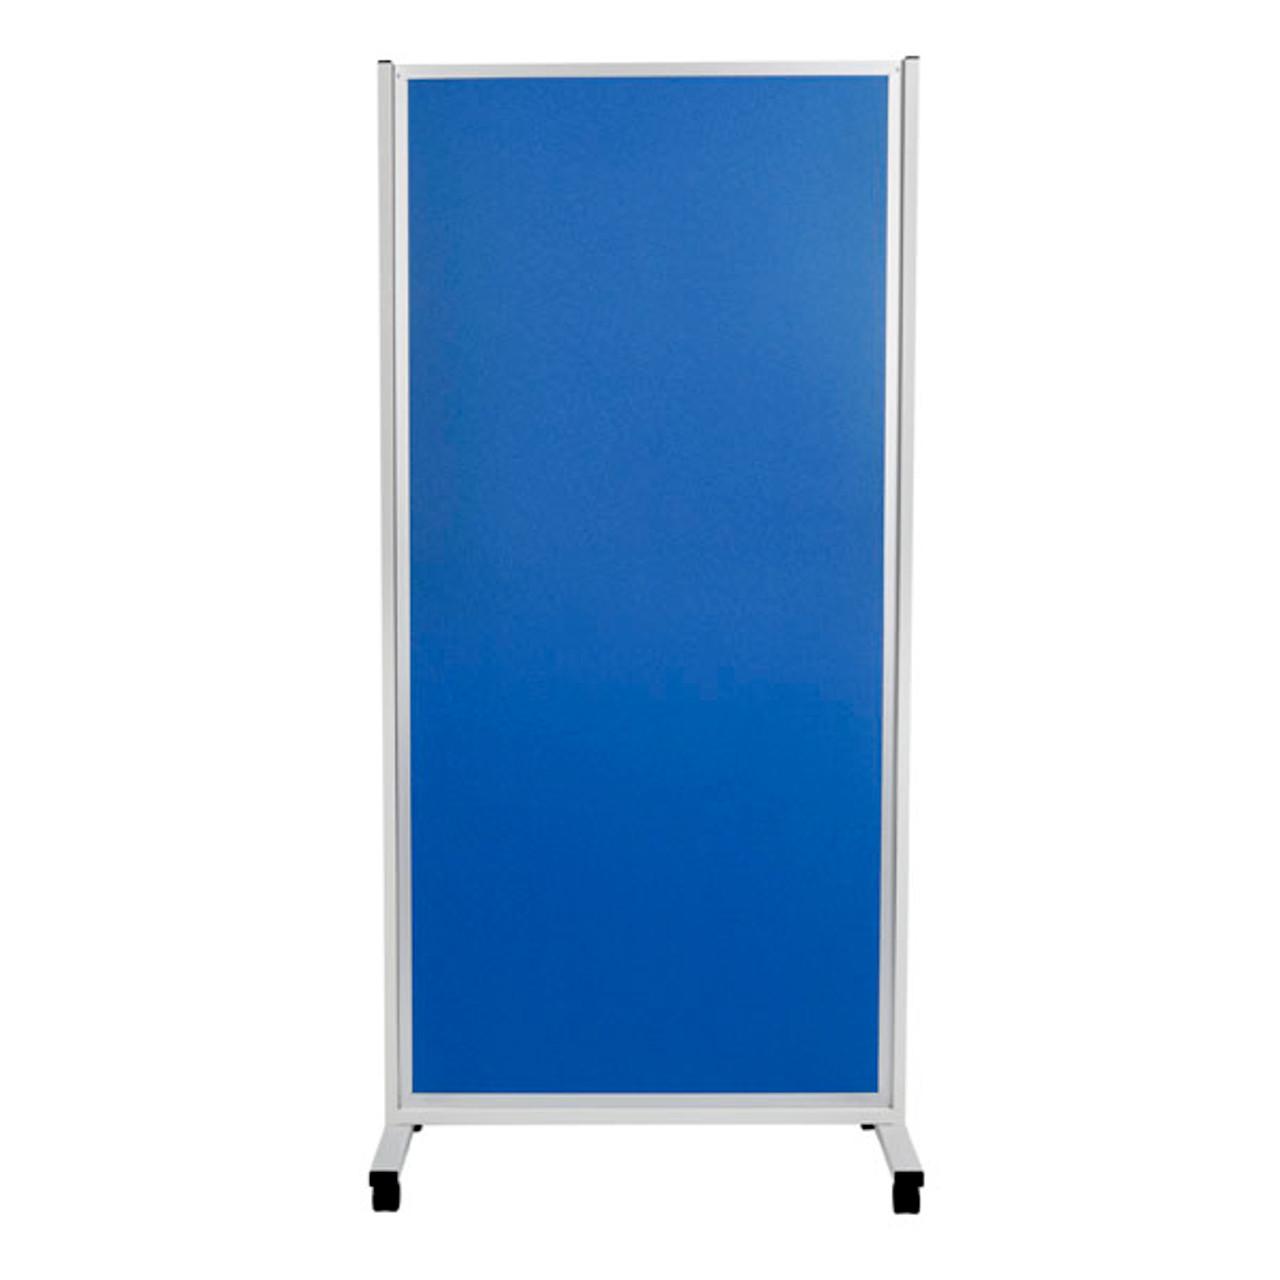 ESSELTE ESSMDP63BL MOBILE DISPLAY PANEL 180H X 90W CM - BLUE